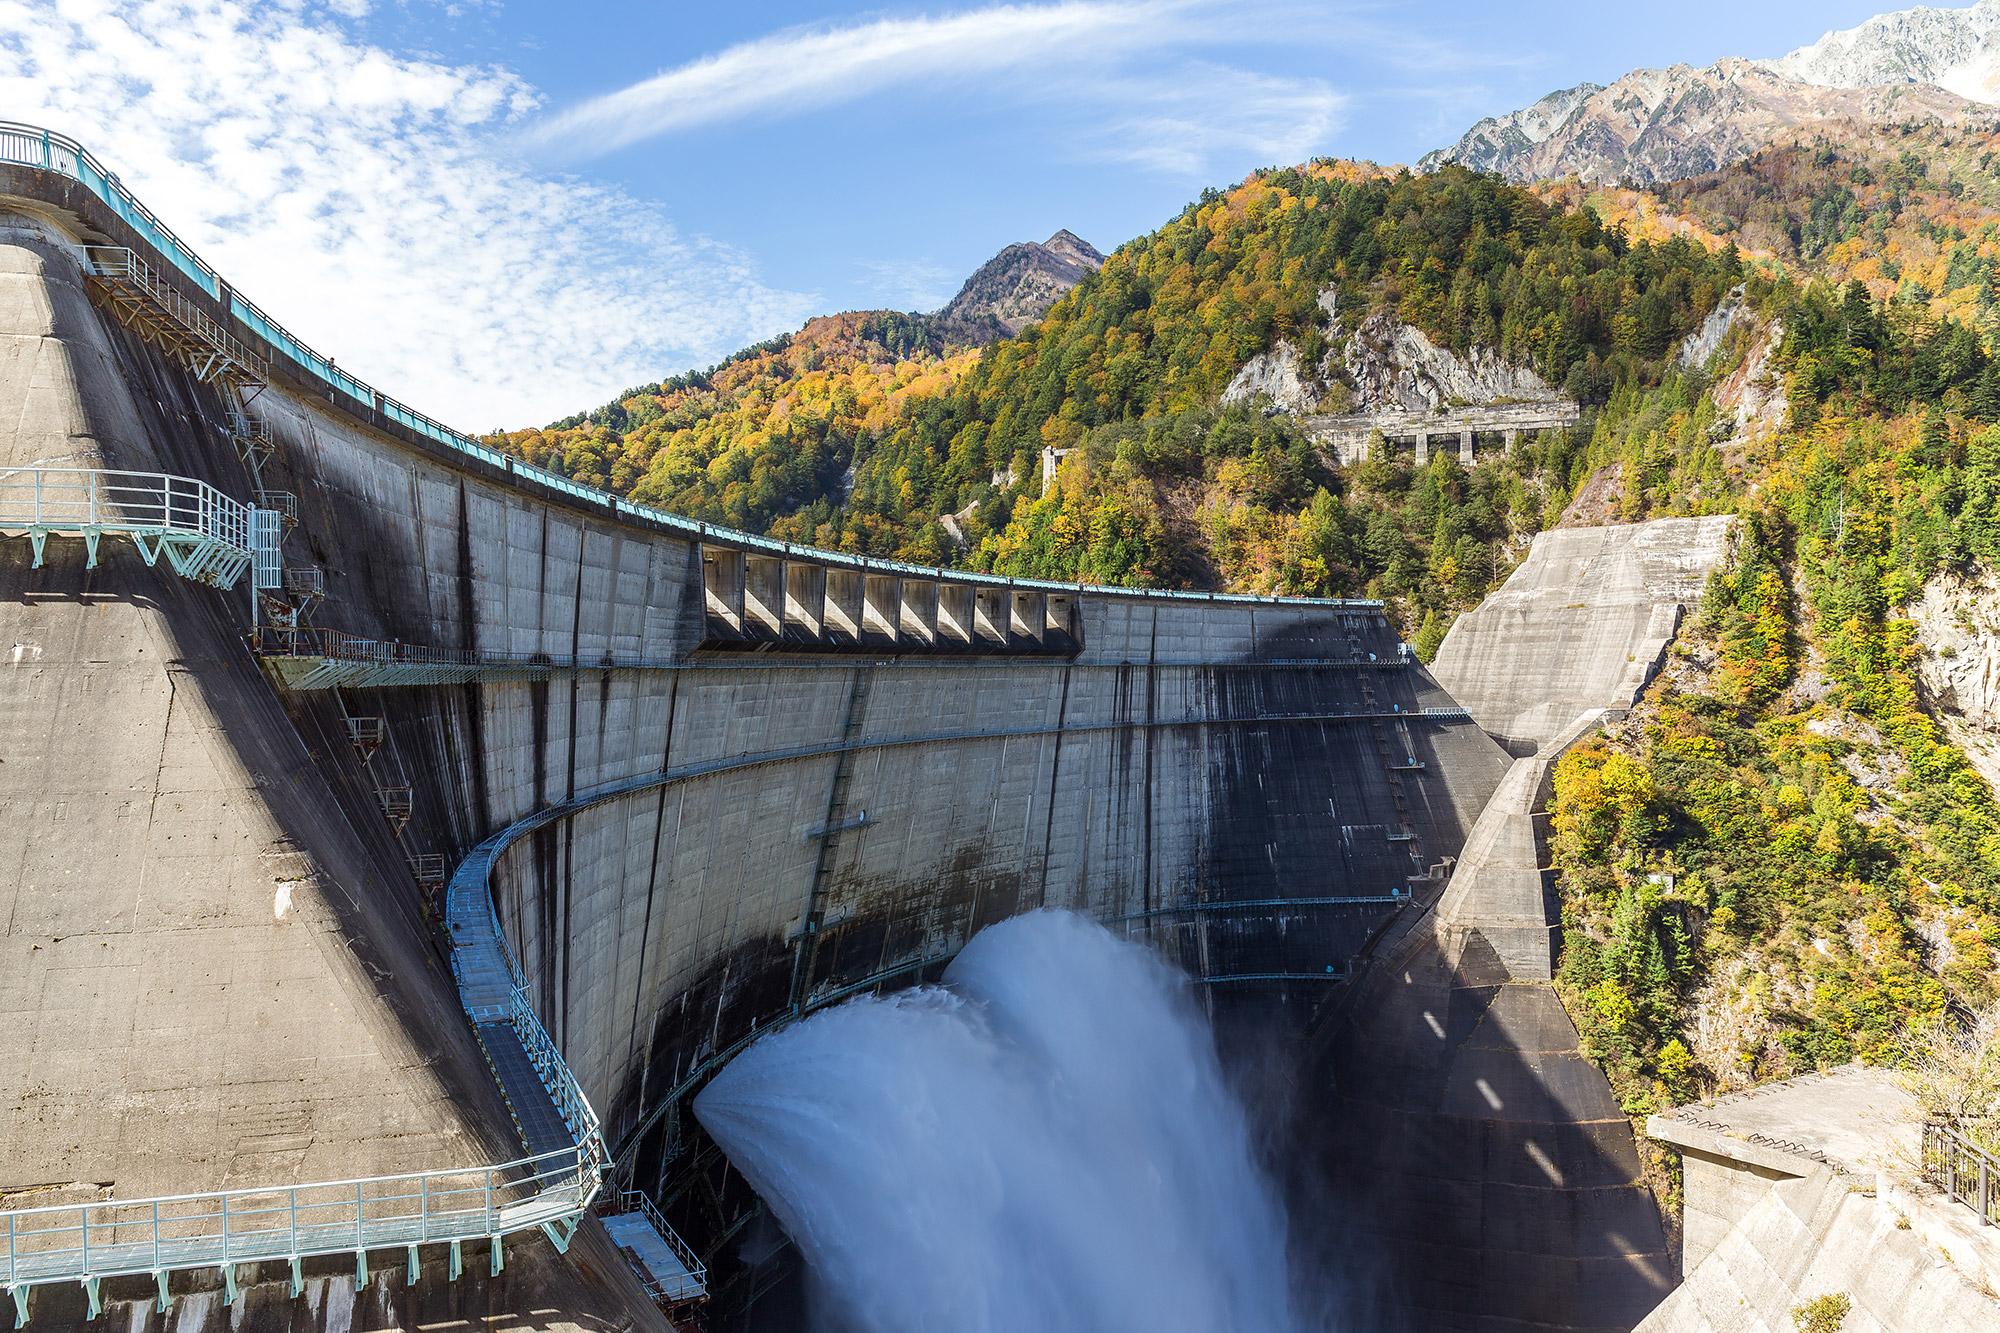 Photo of a dam